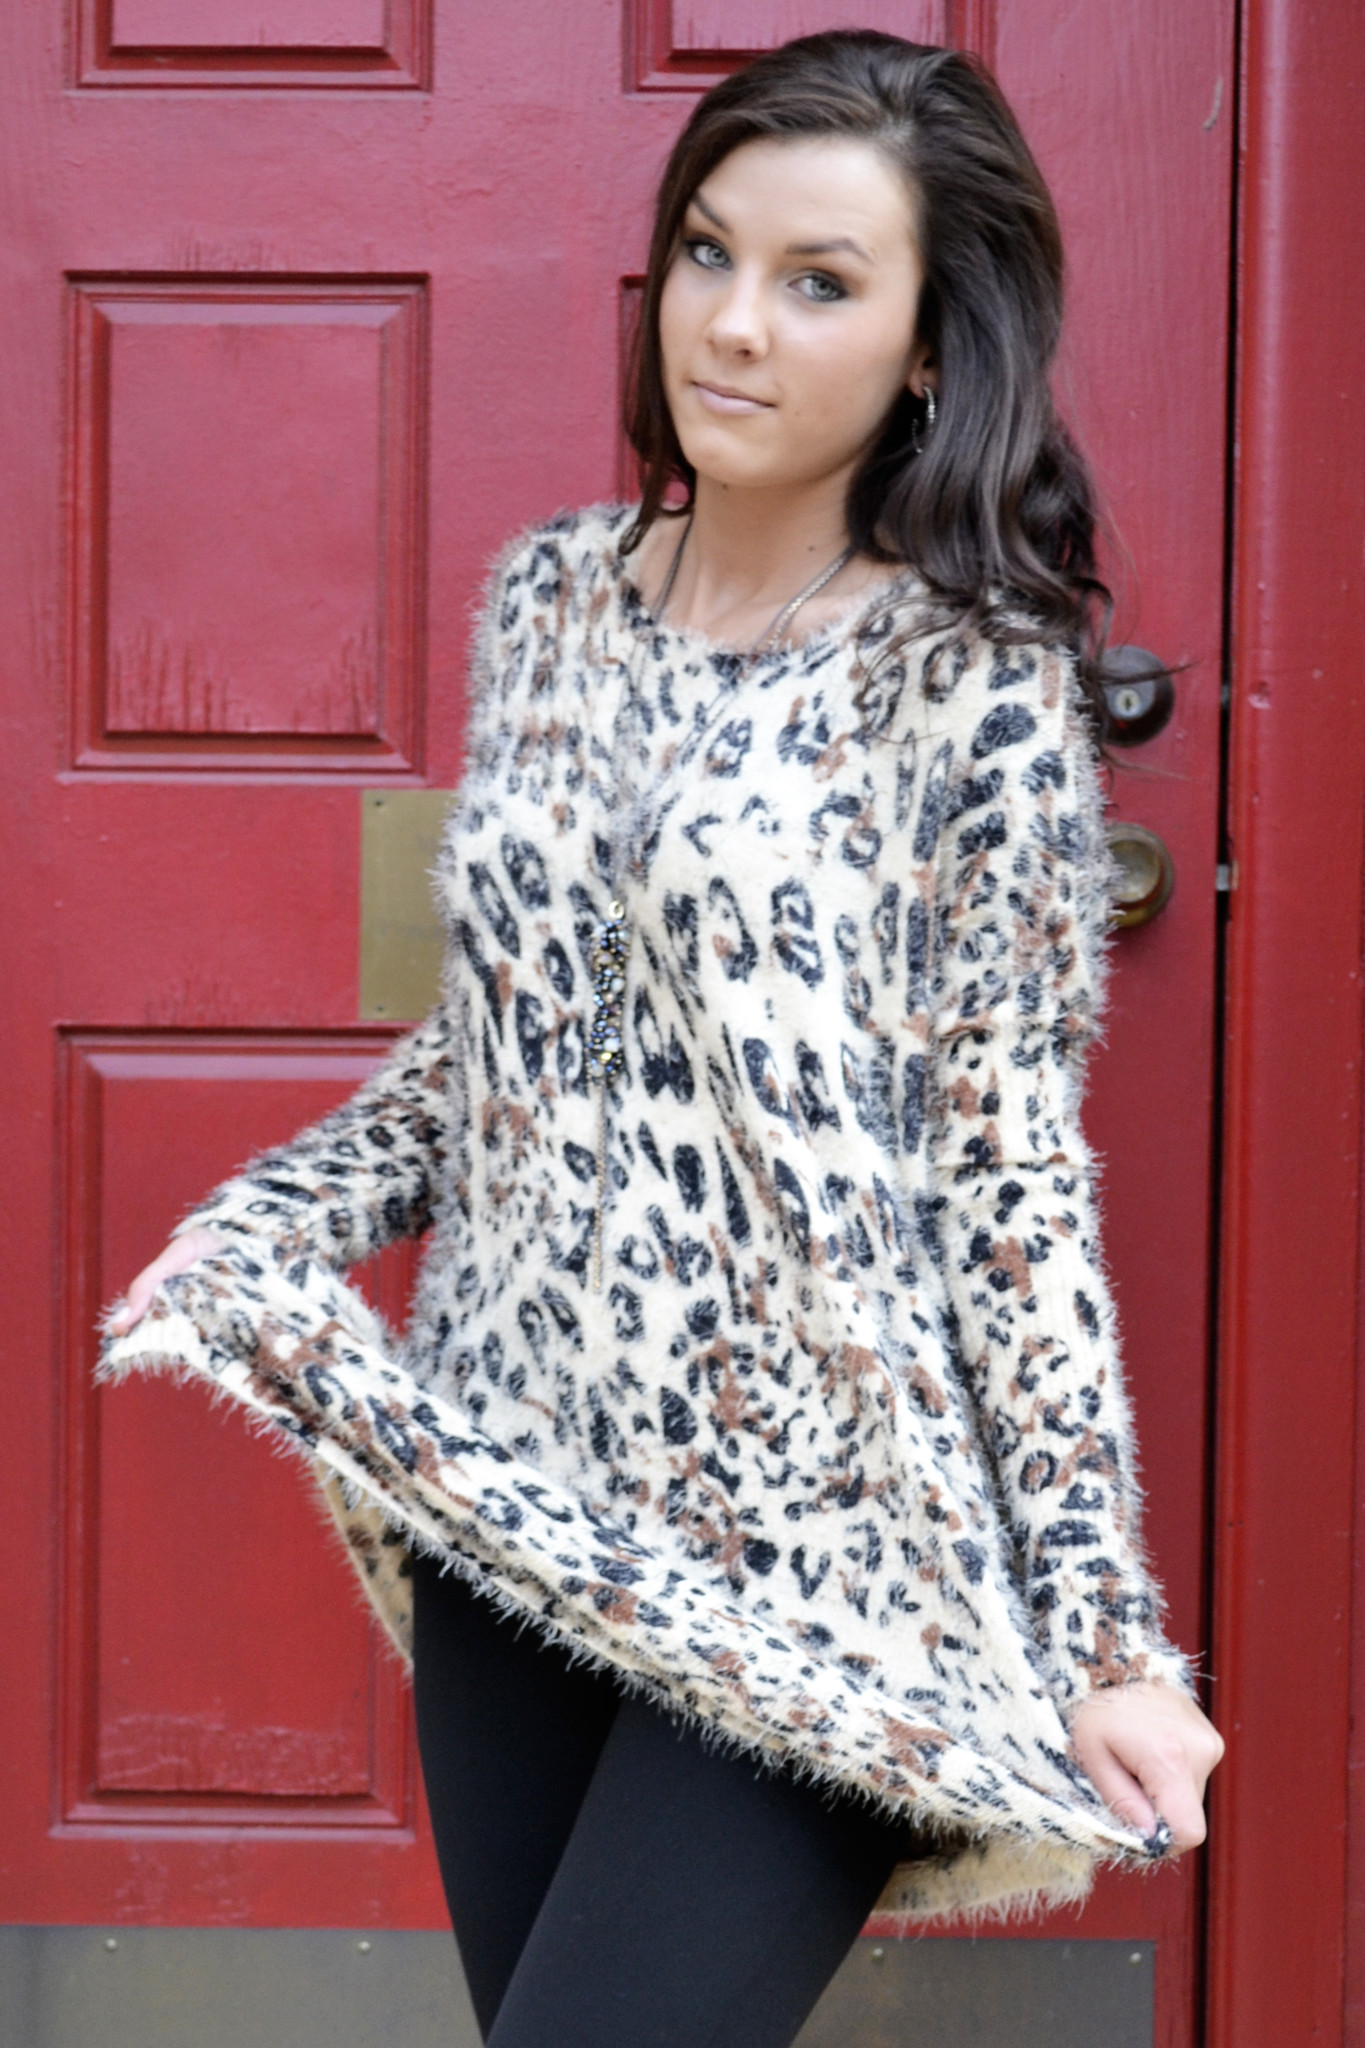 Cheetahlicious sweater